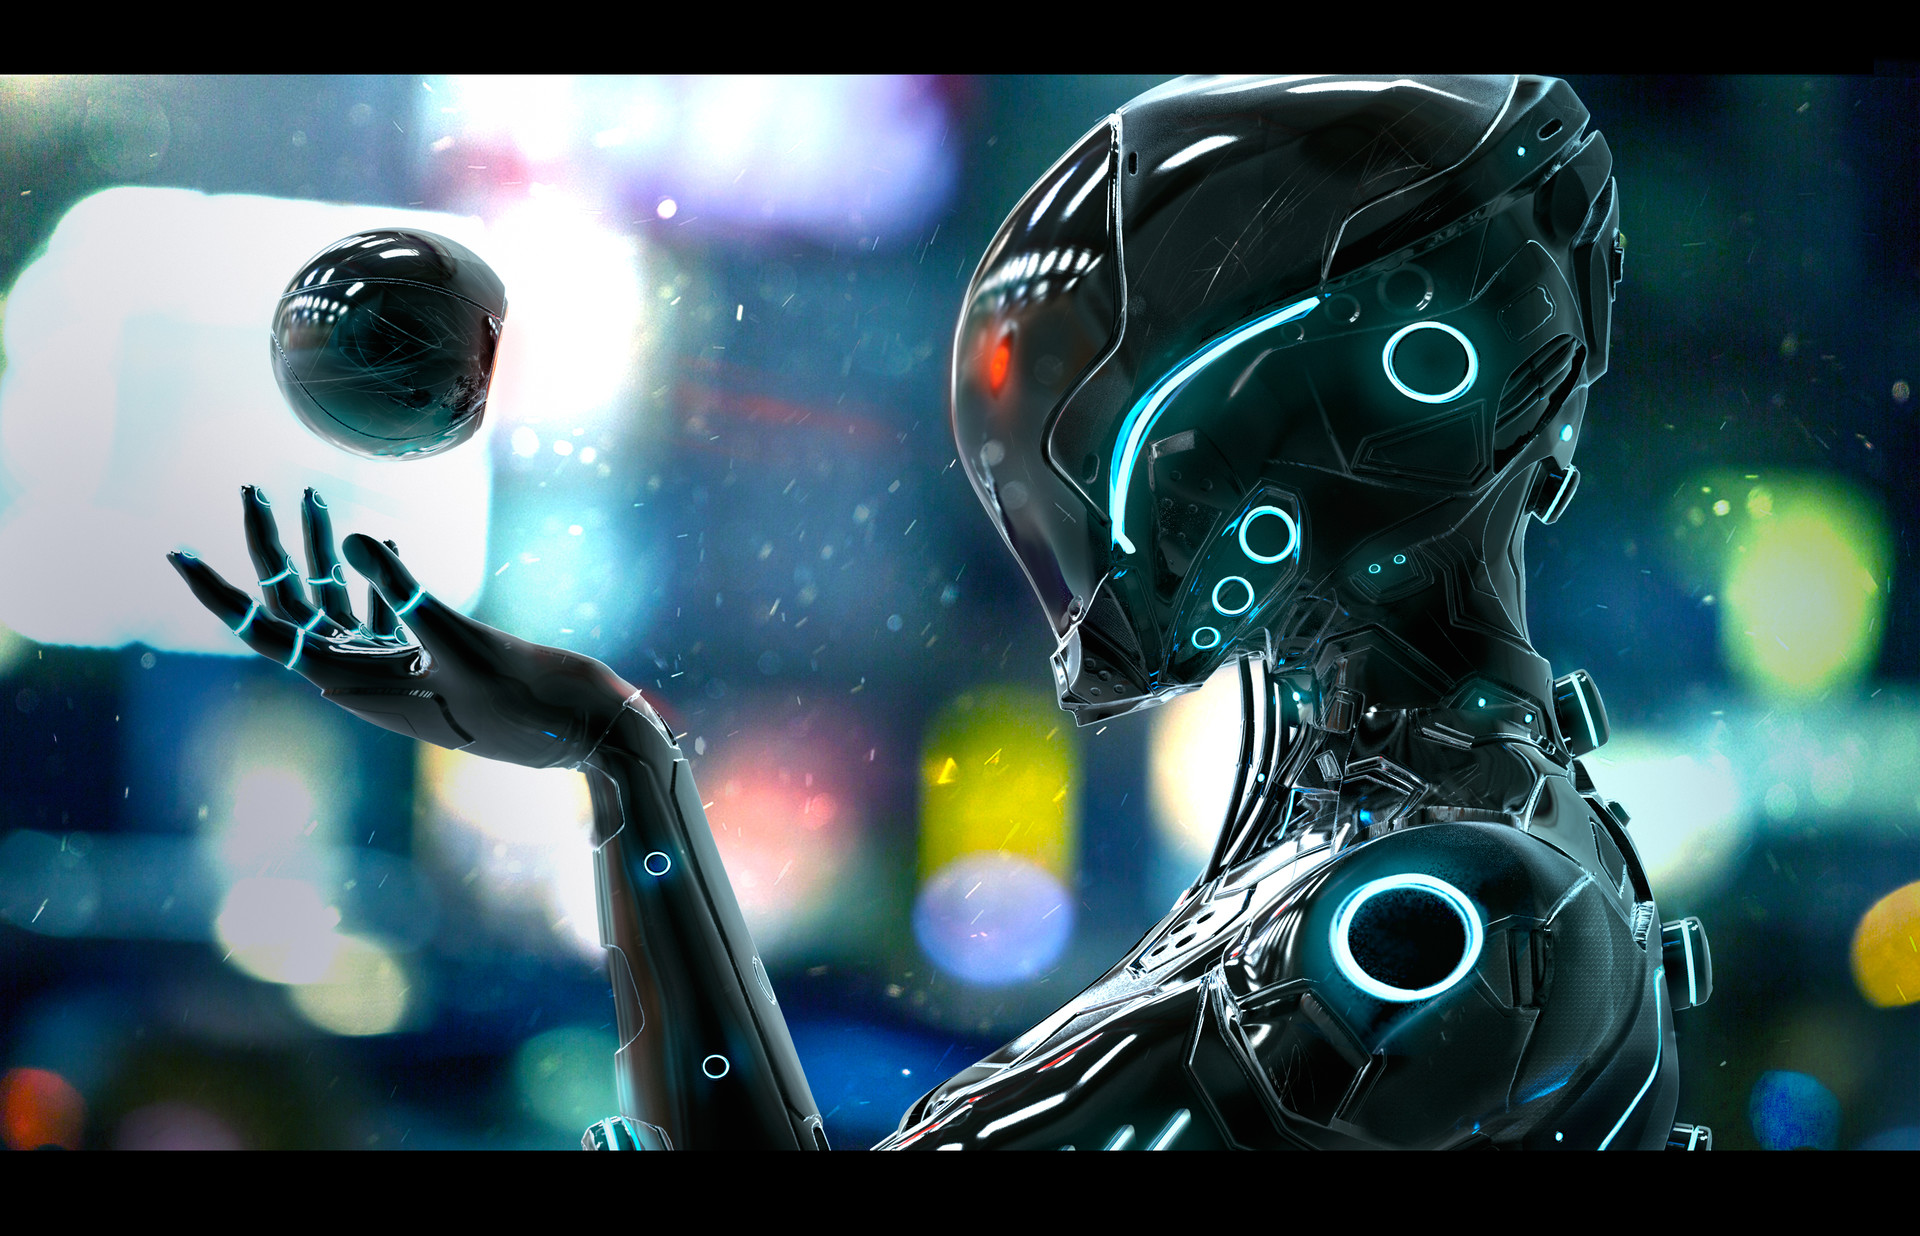 The Futuristic Digital Art Of Oskar Woinski Sci Fi Artist